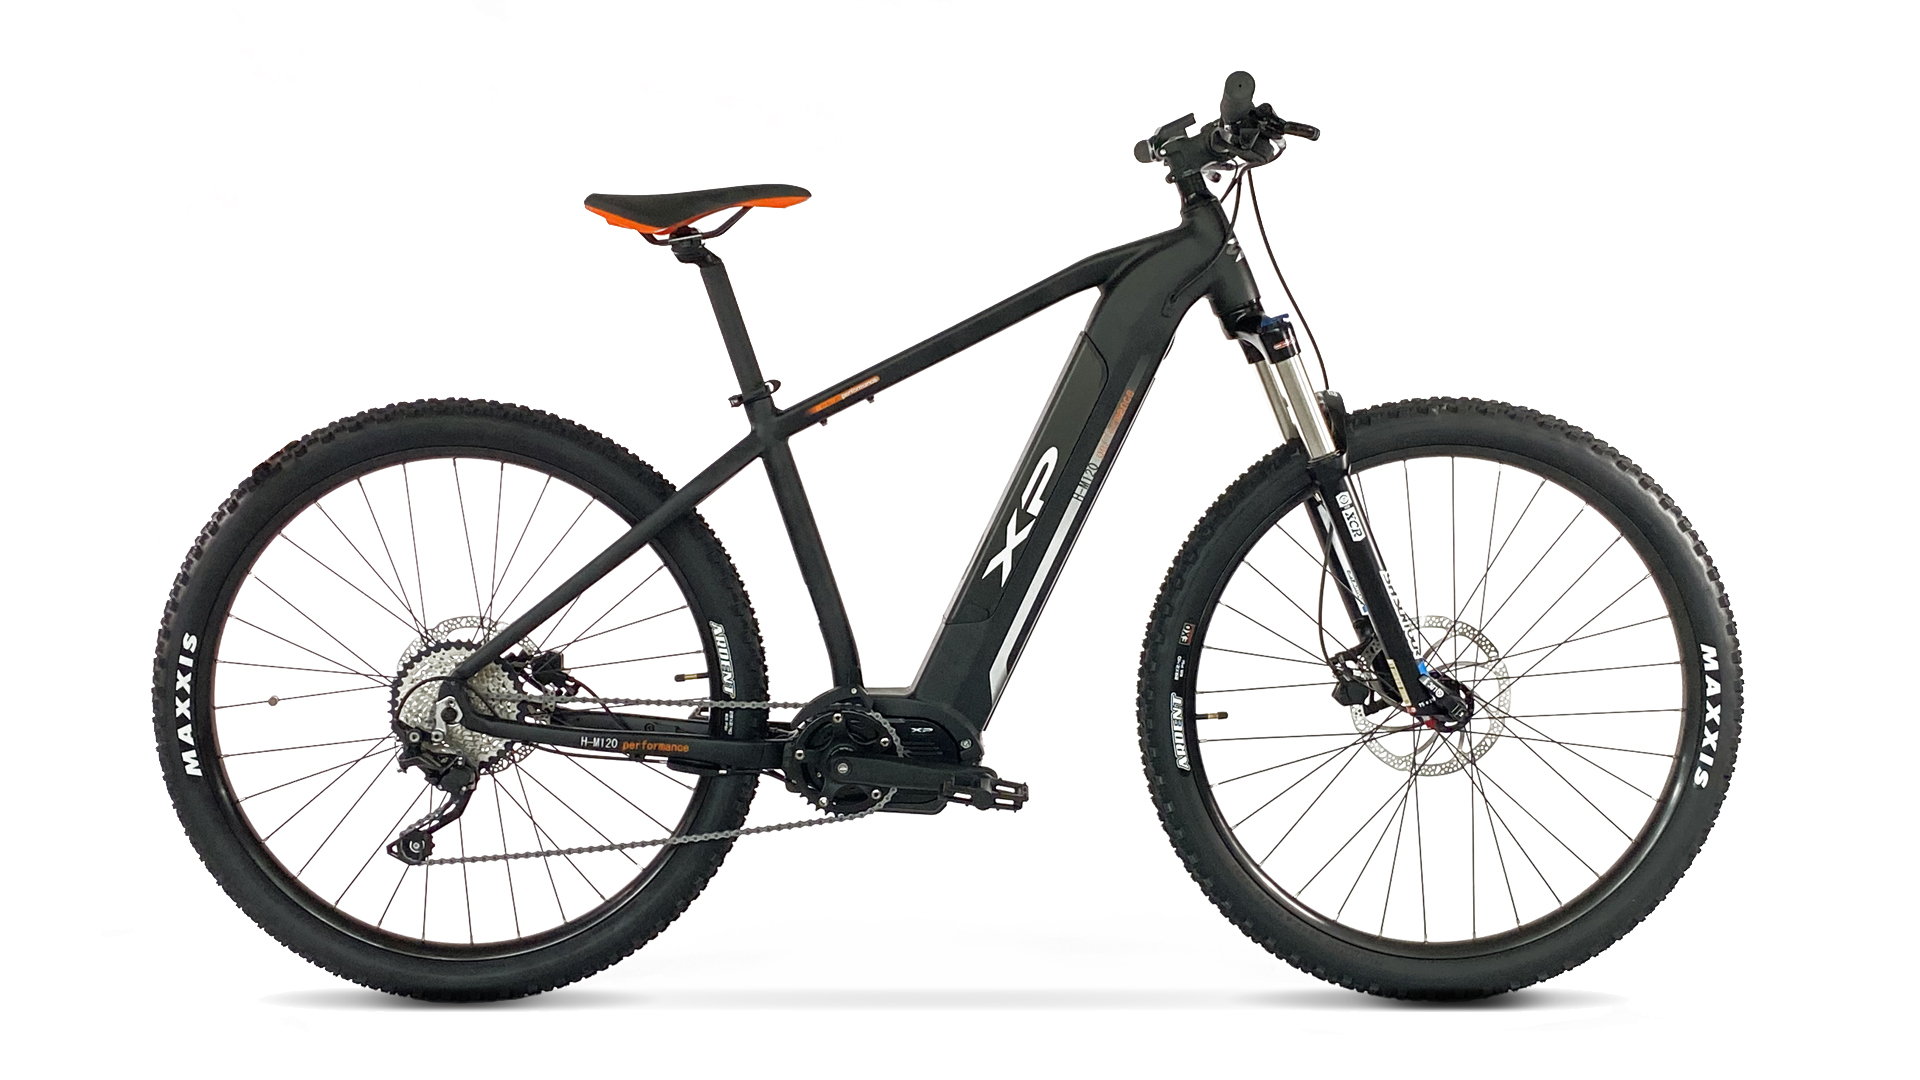 Greenbike pesaro-XP Bikes-MTB elettriche-H-M120